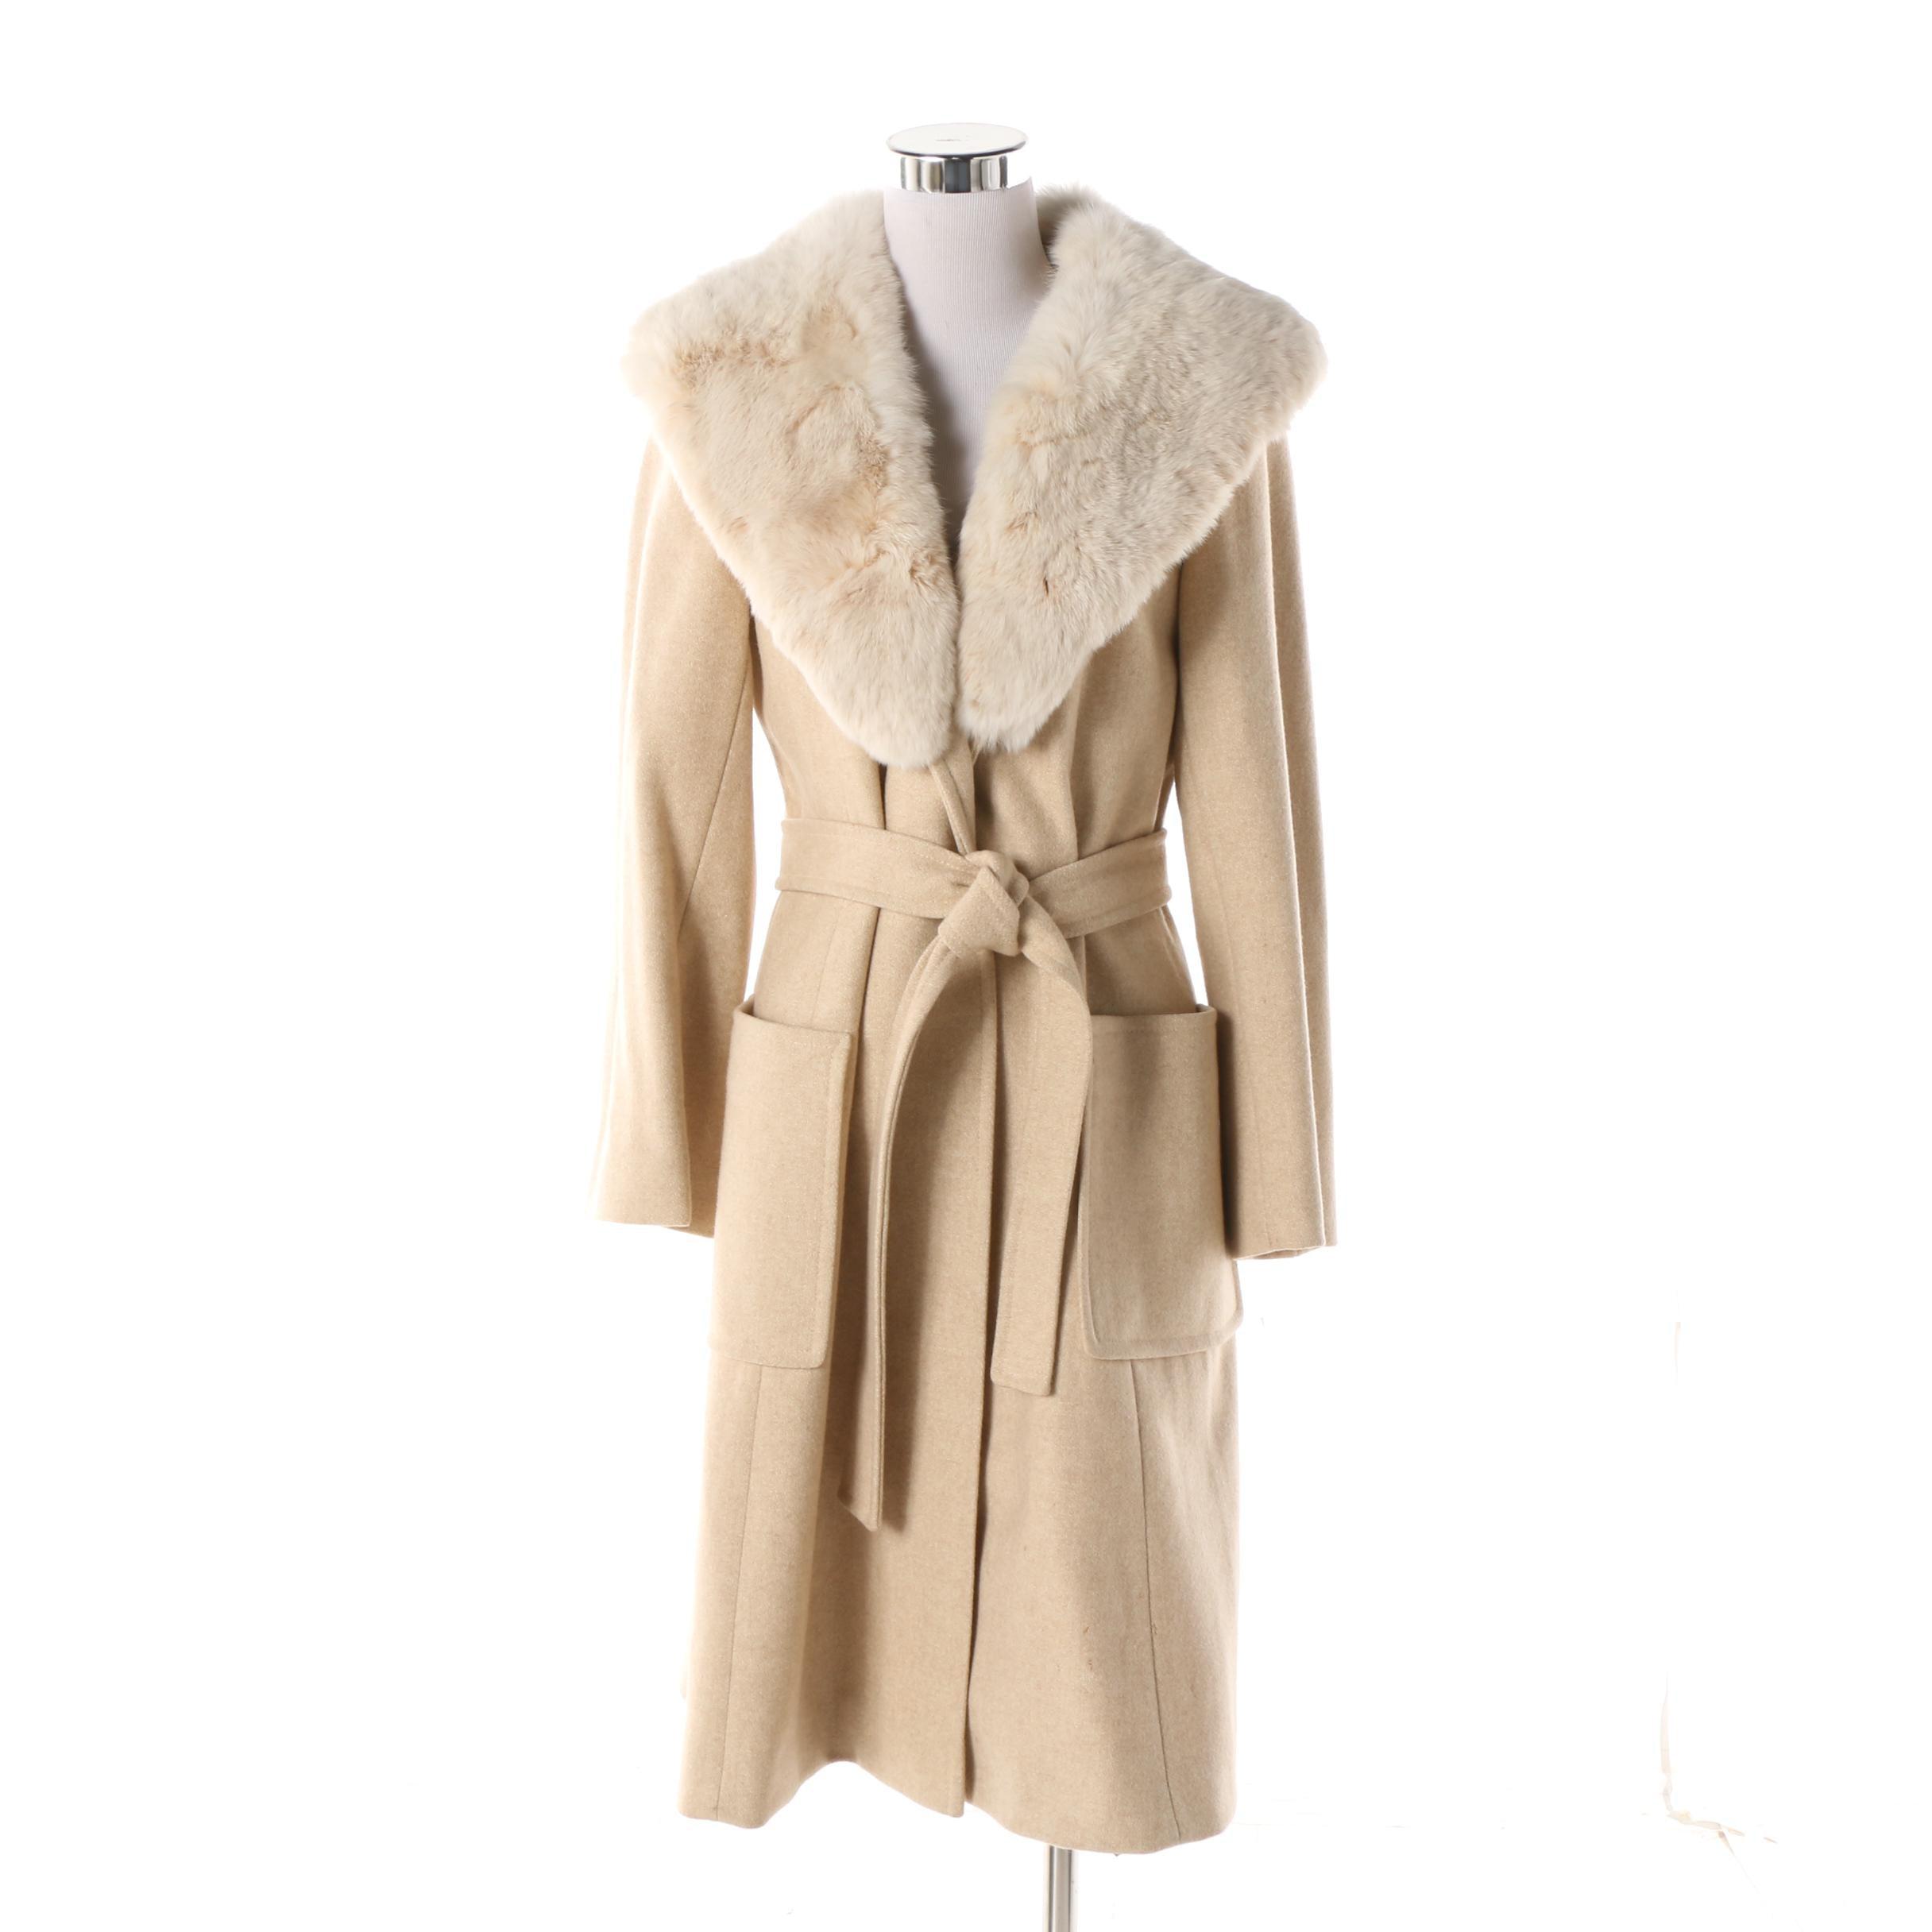 Women's Vintage Youthcraft Oatmeal Wool Princess Coat with Rabbit Fur Collar